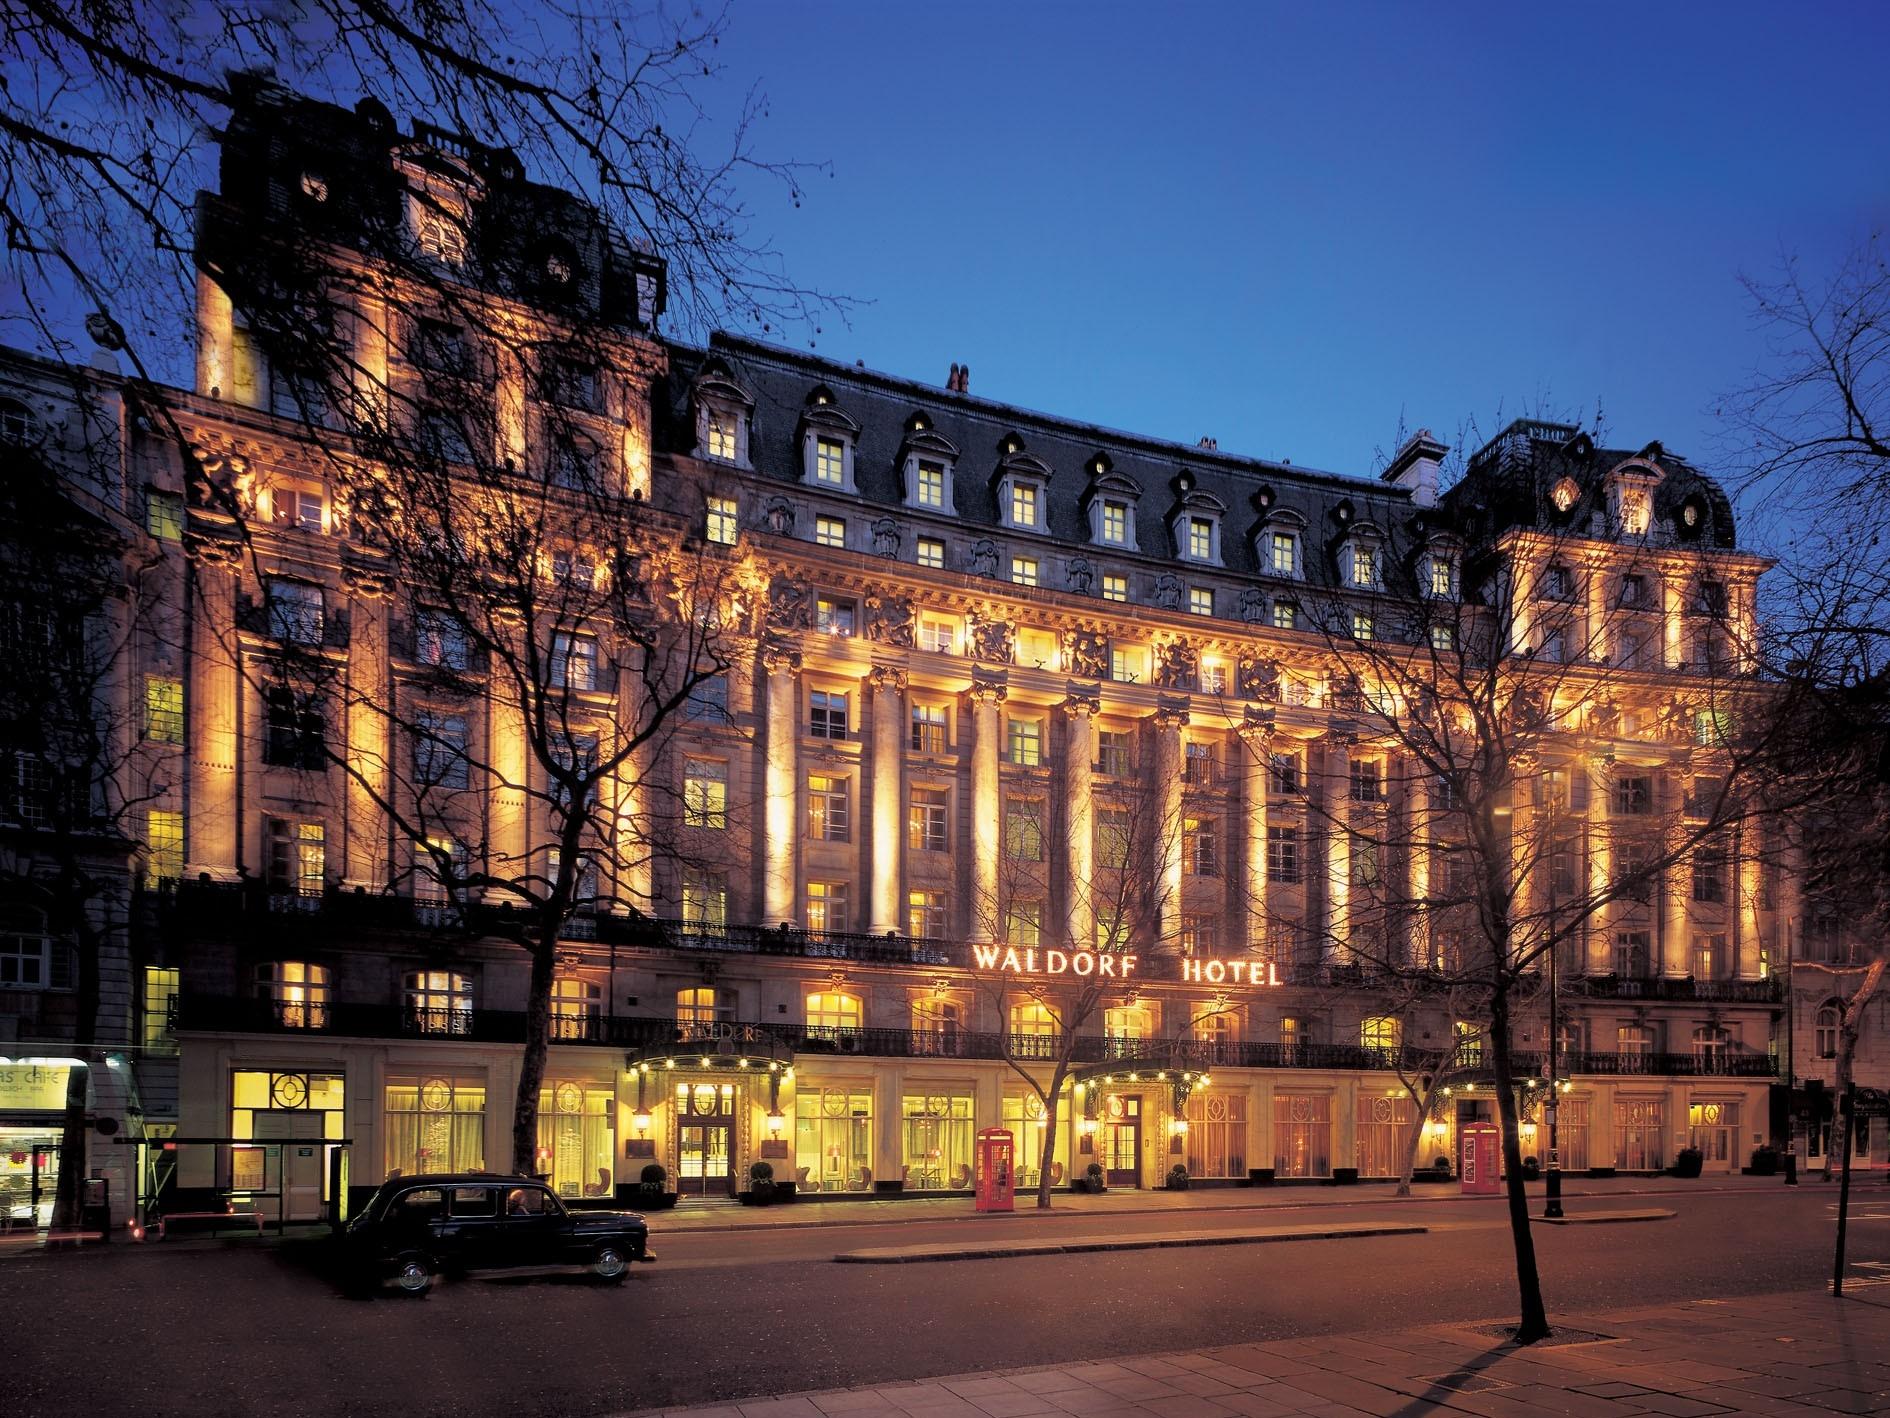 Hilton Waldorf, The Strand, London